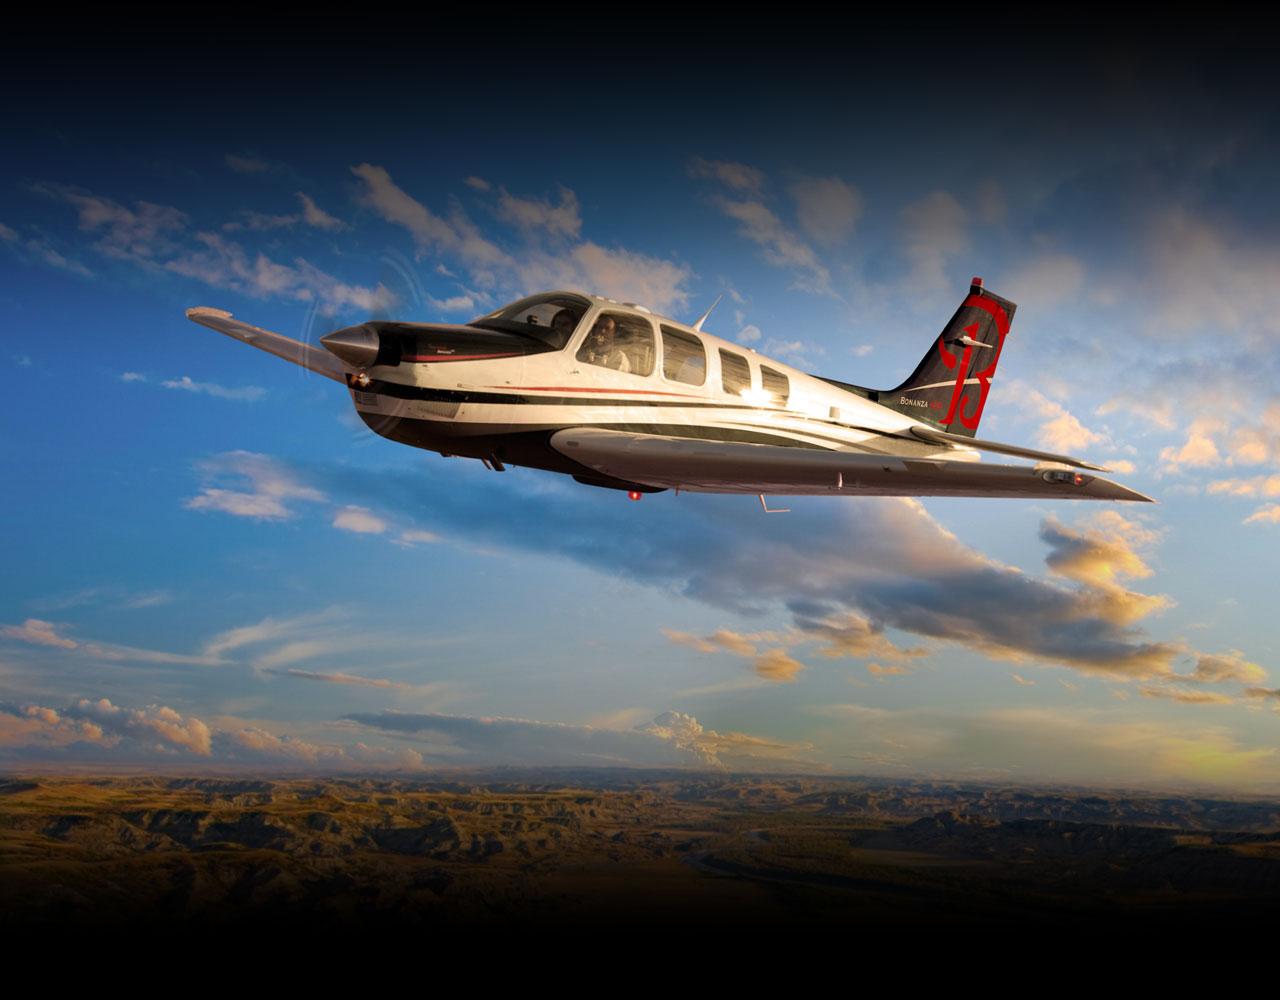 Beechcraft Delivers 4,000th Model 36 Bonanza